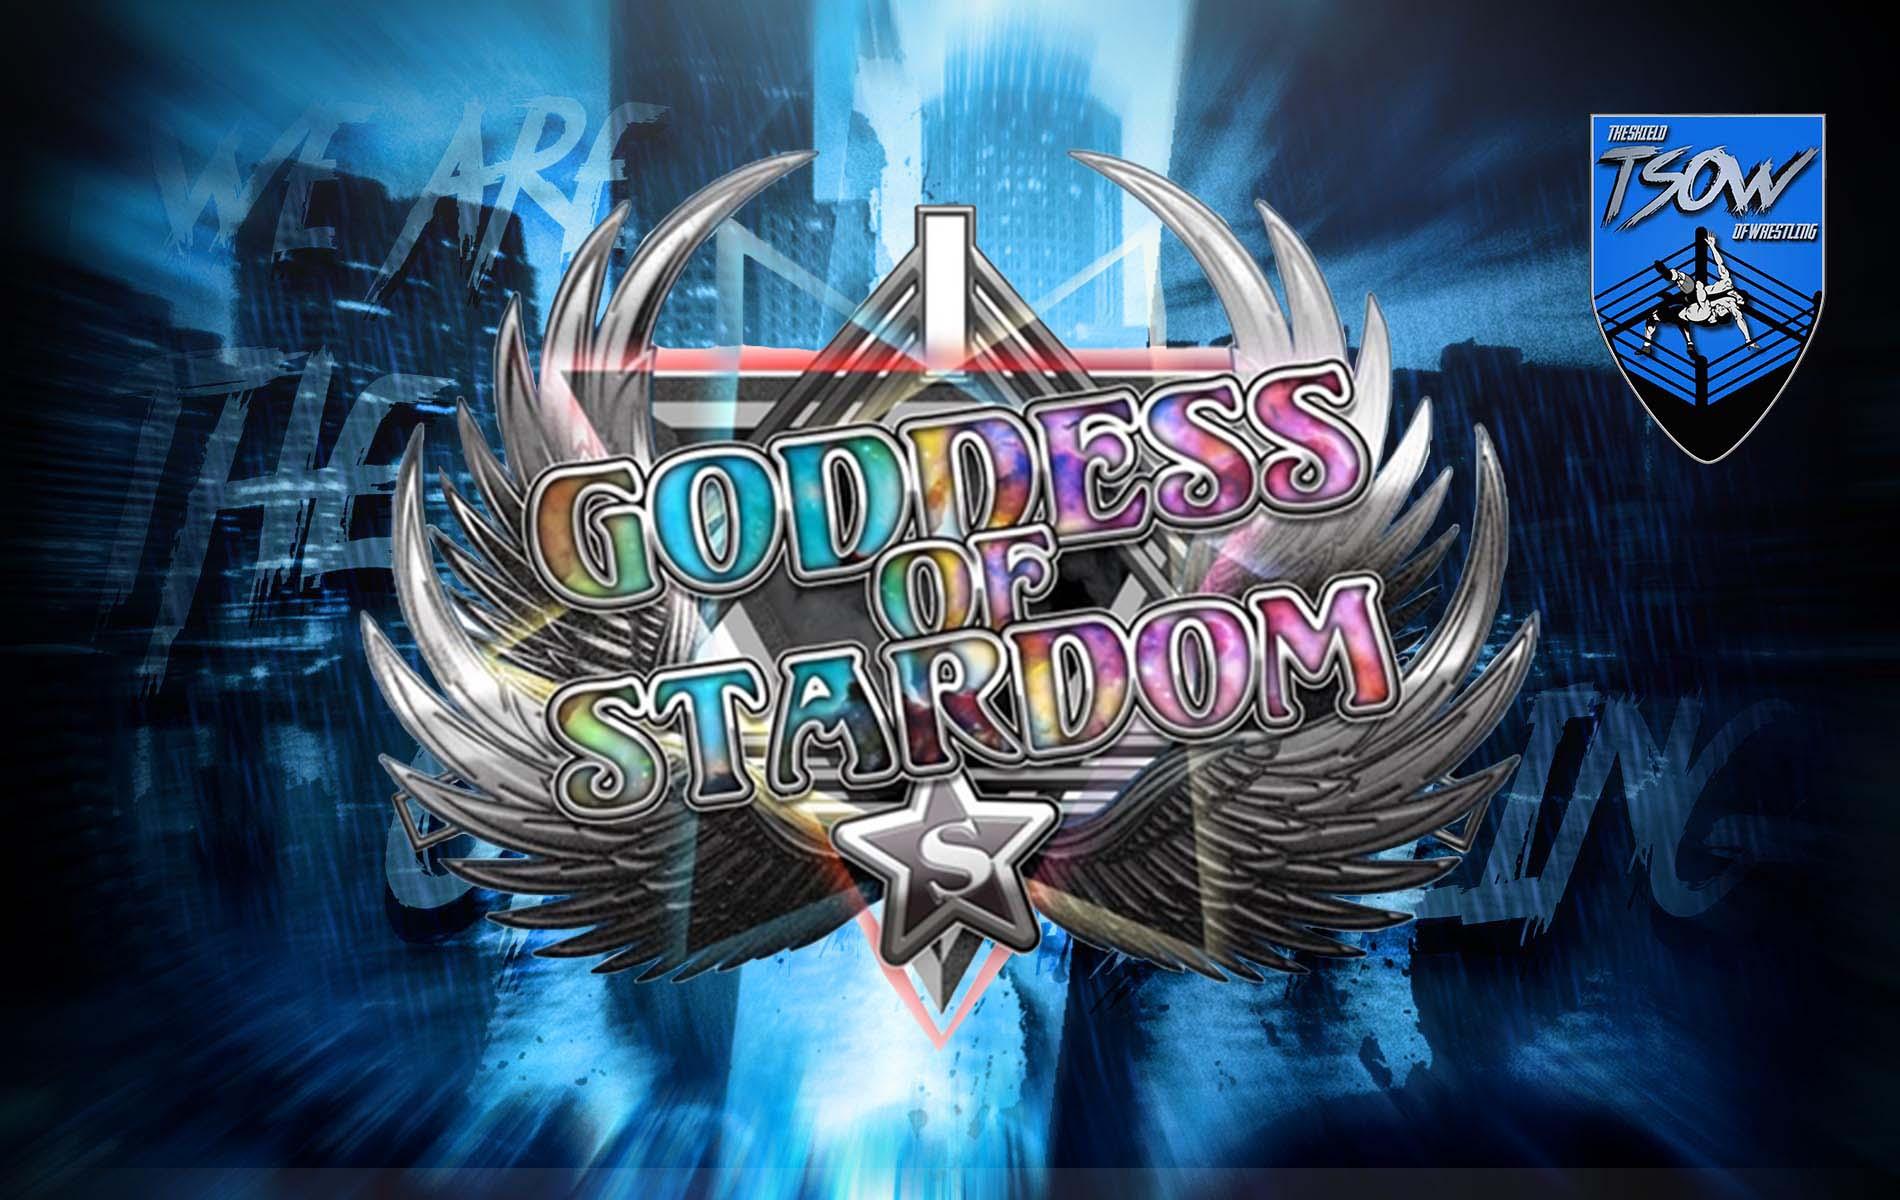 STARDOM Goddess of Stardom Tag League 2020 Risultati – Day 2